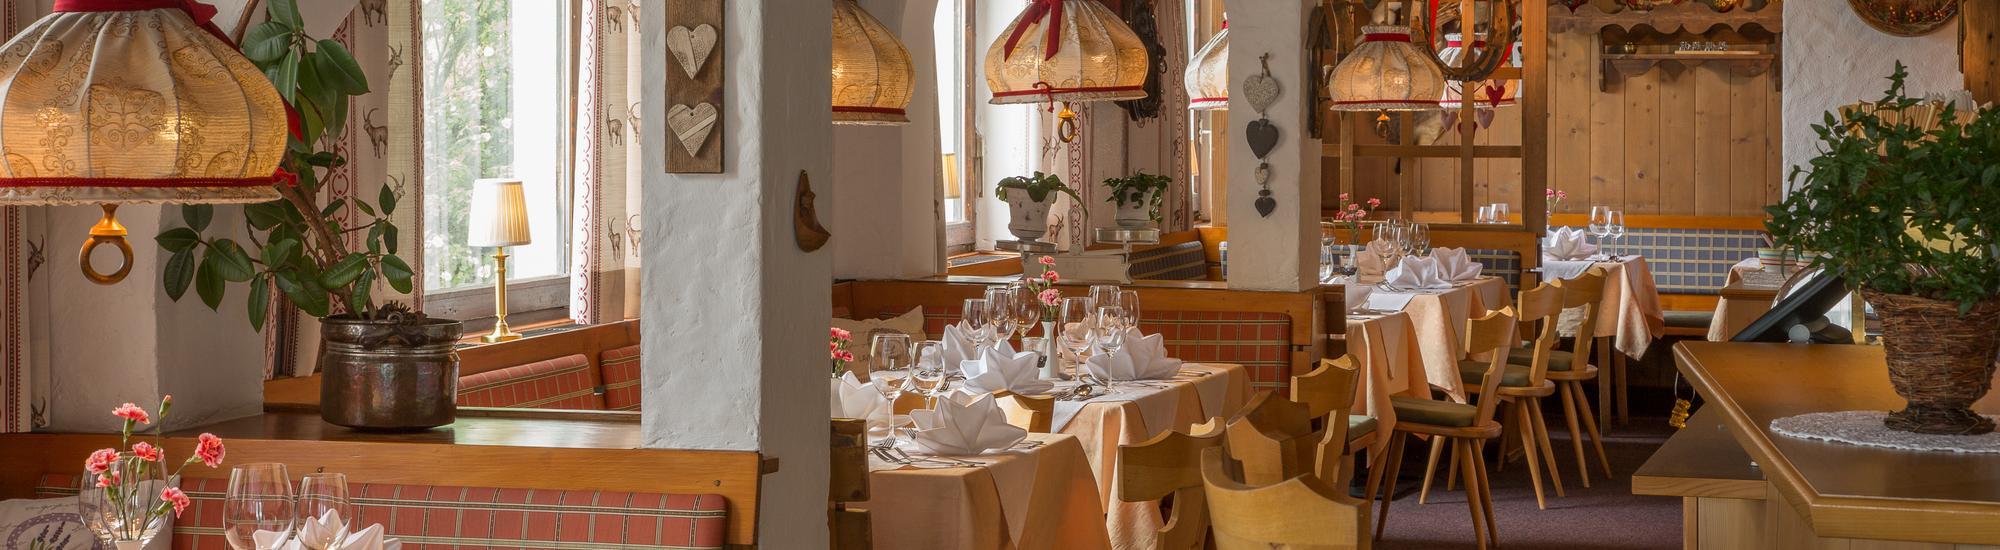 restaurant-hotel-bergerhof-2-s